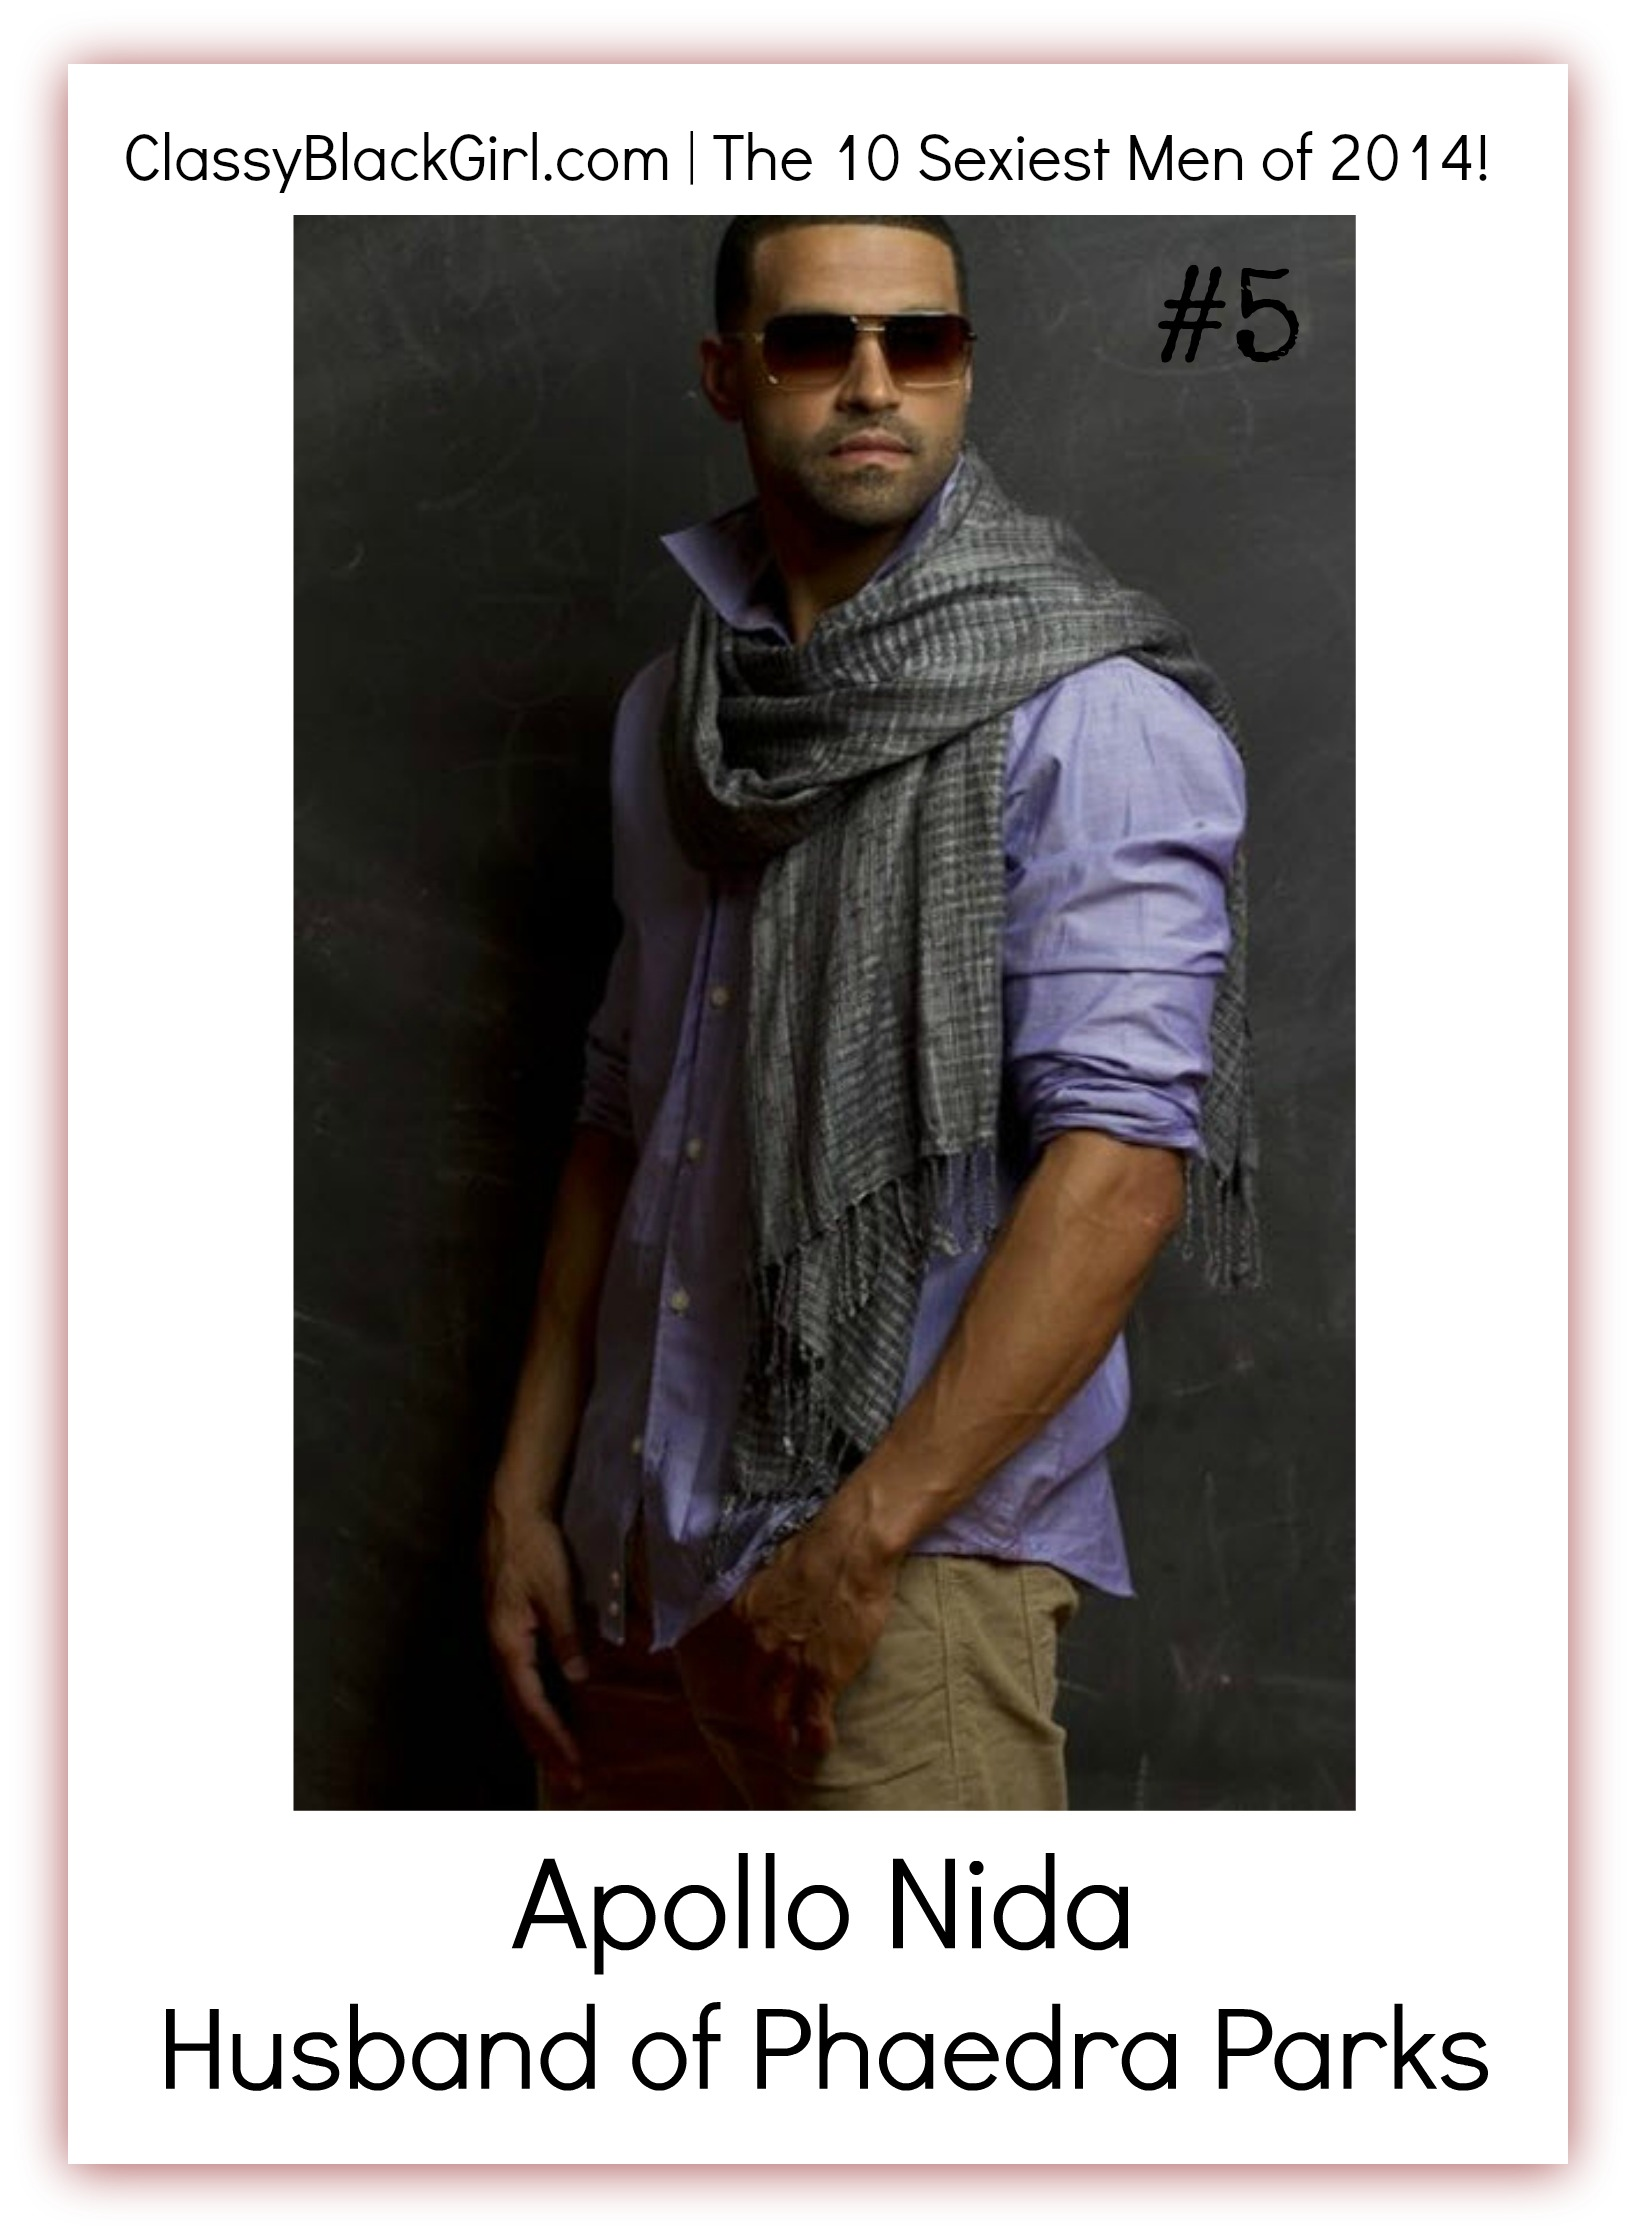 Apollo Nida RHOA Classy Black Girl 10 Sexiest men od 2014